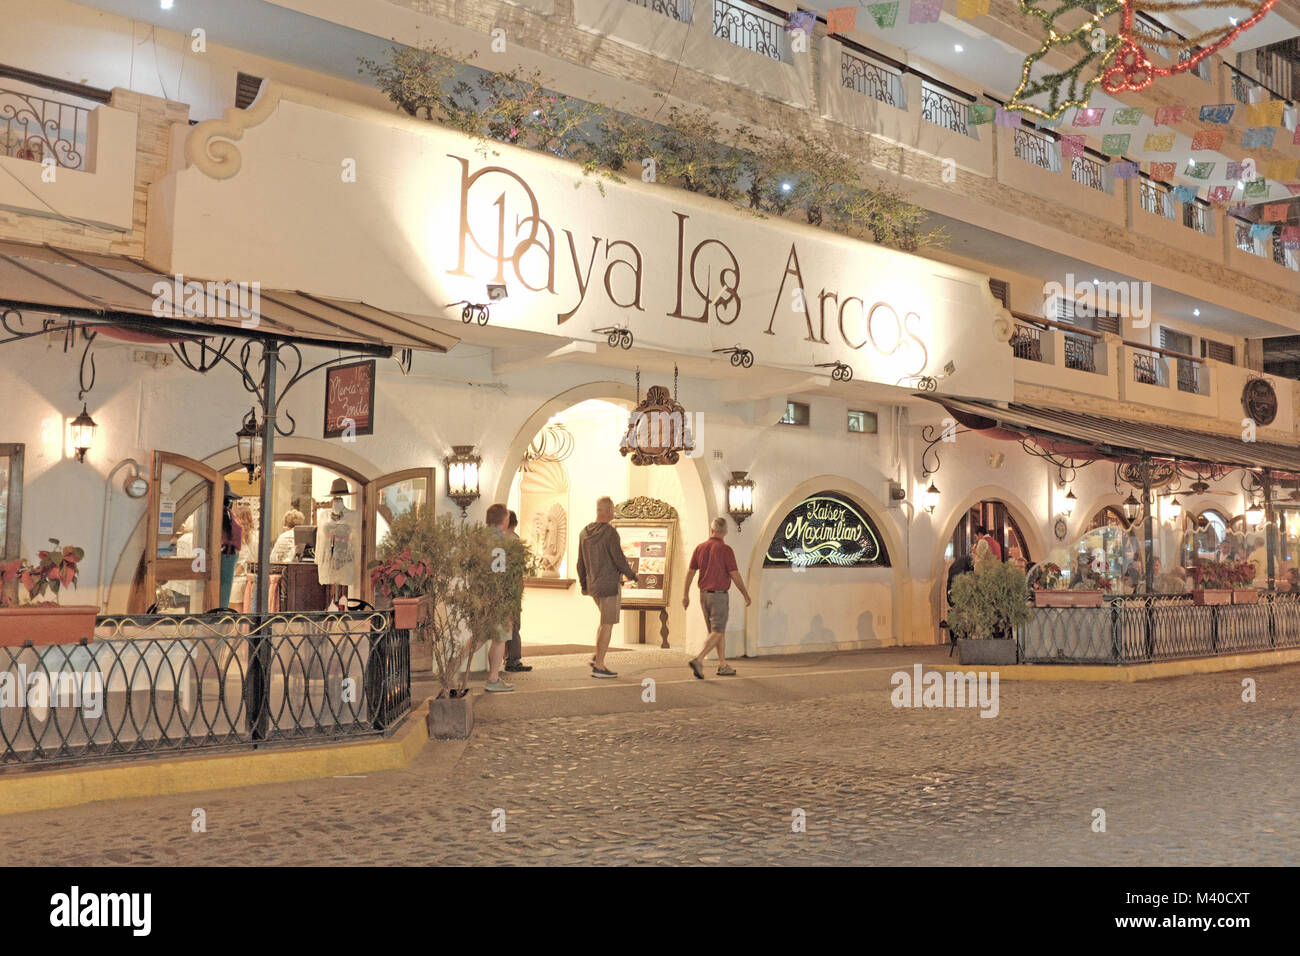 The Playa Los Arcos Hotel In The Zona Romantica Neighborhood Of